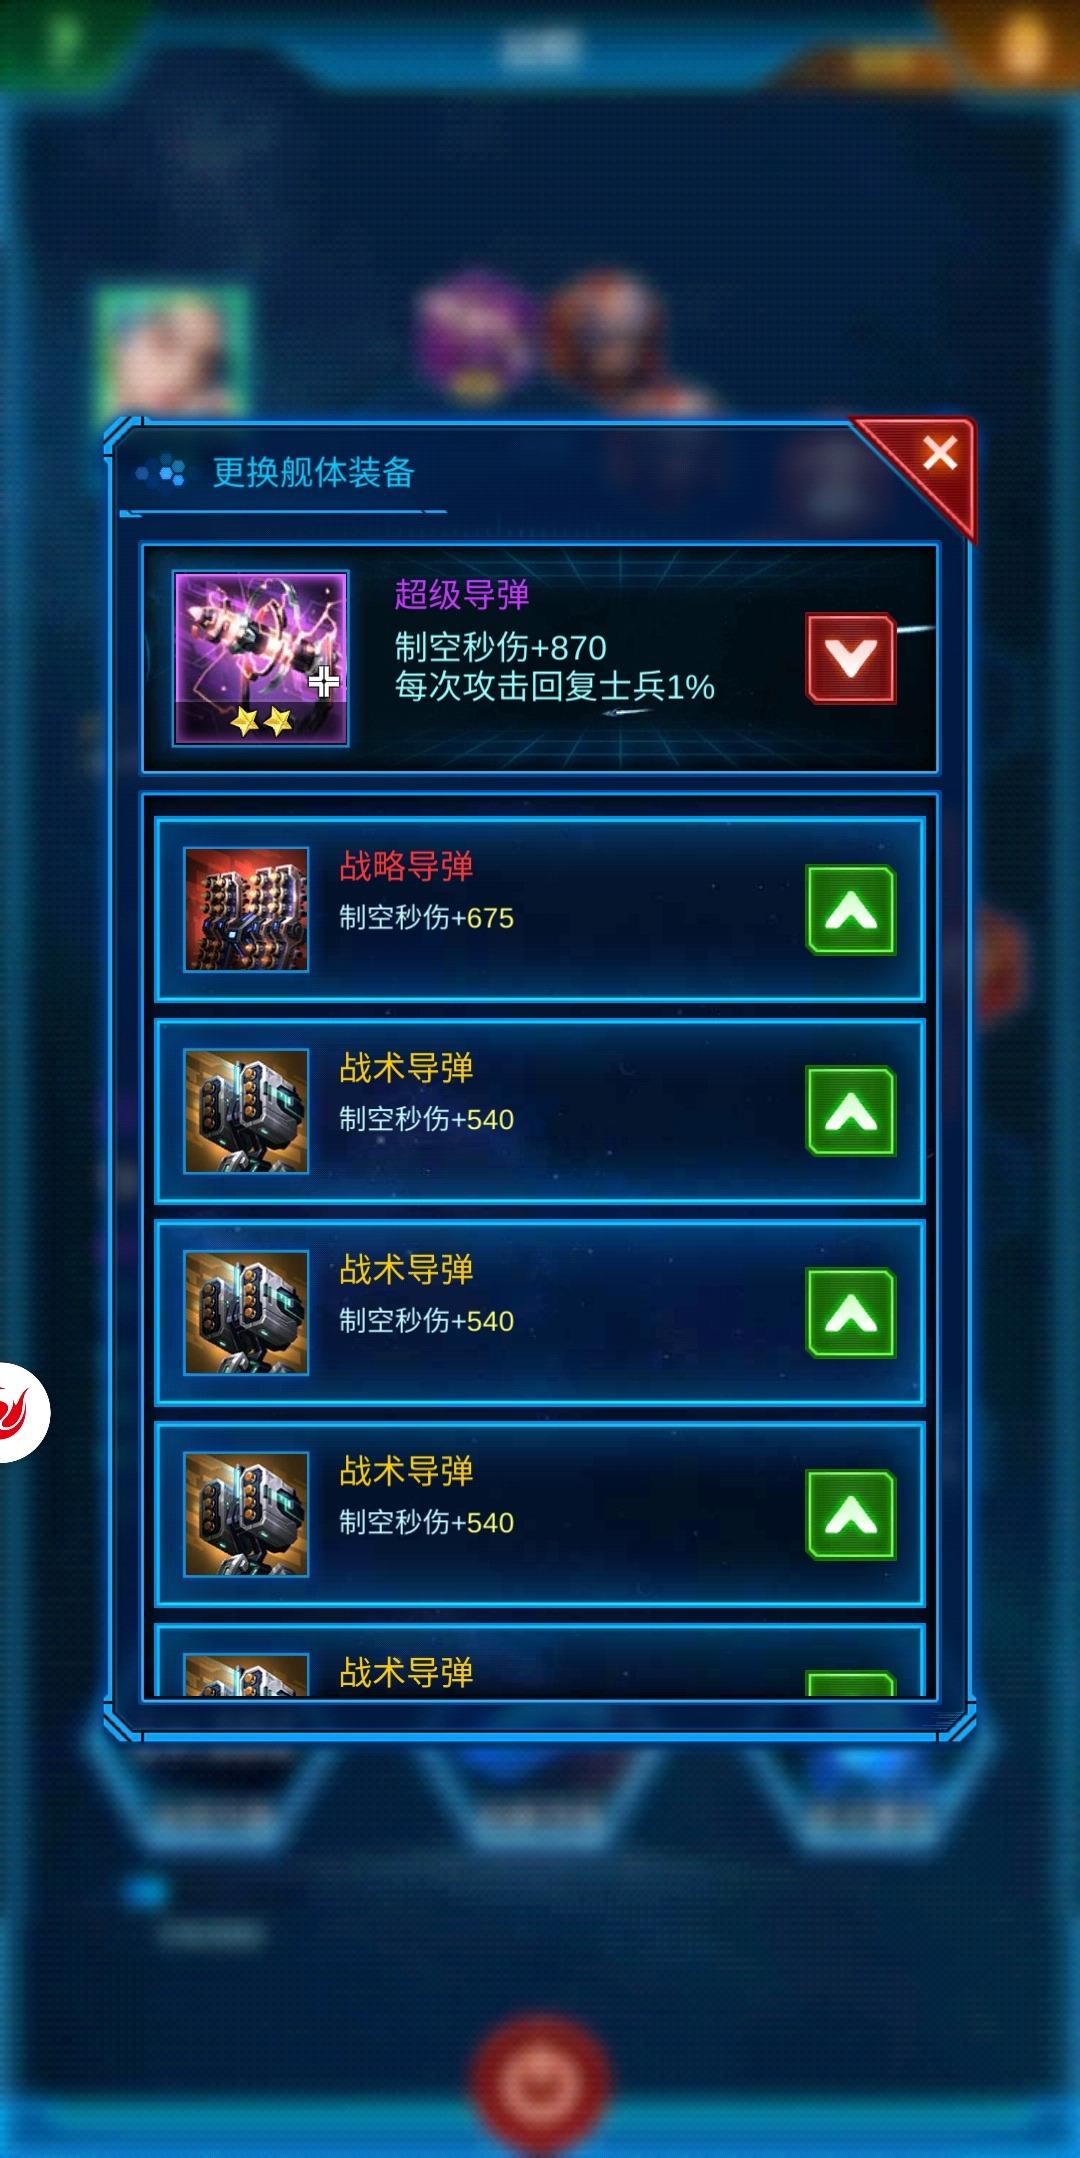 Screenshot_2021-03-13-18-12-05-998_com.jedigames.p16s.luobo.jpg